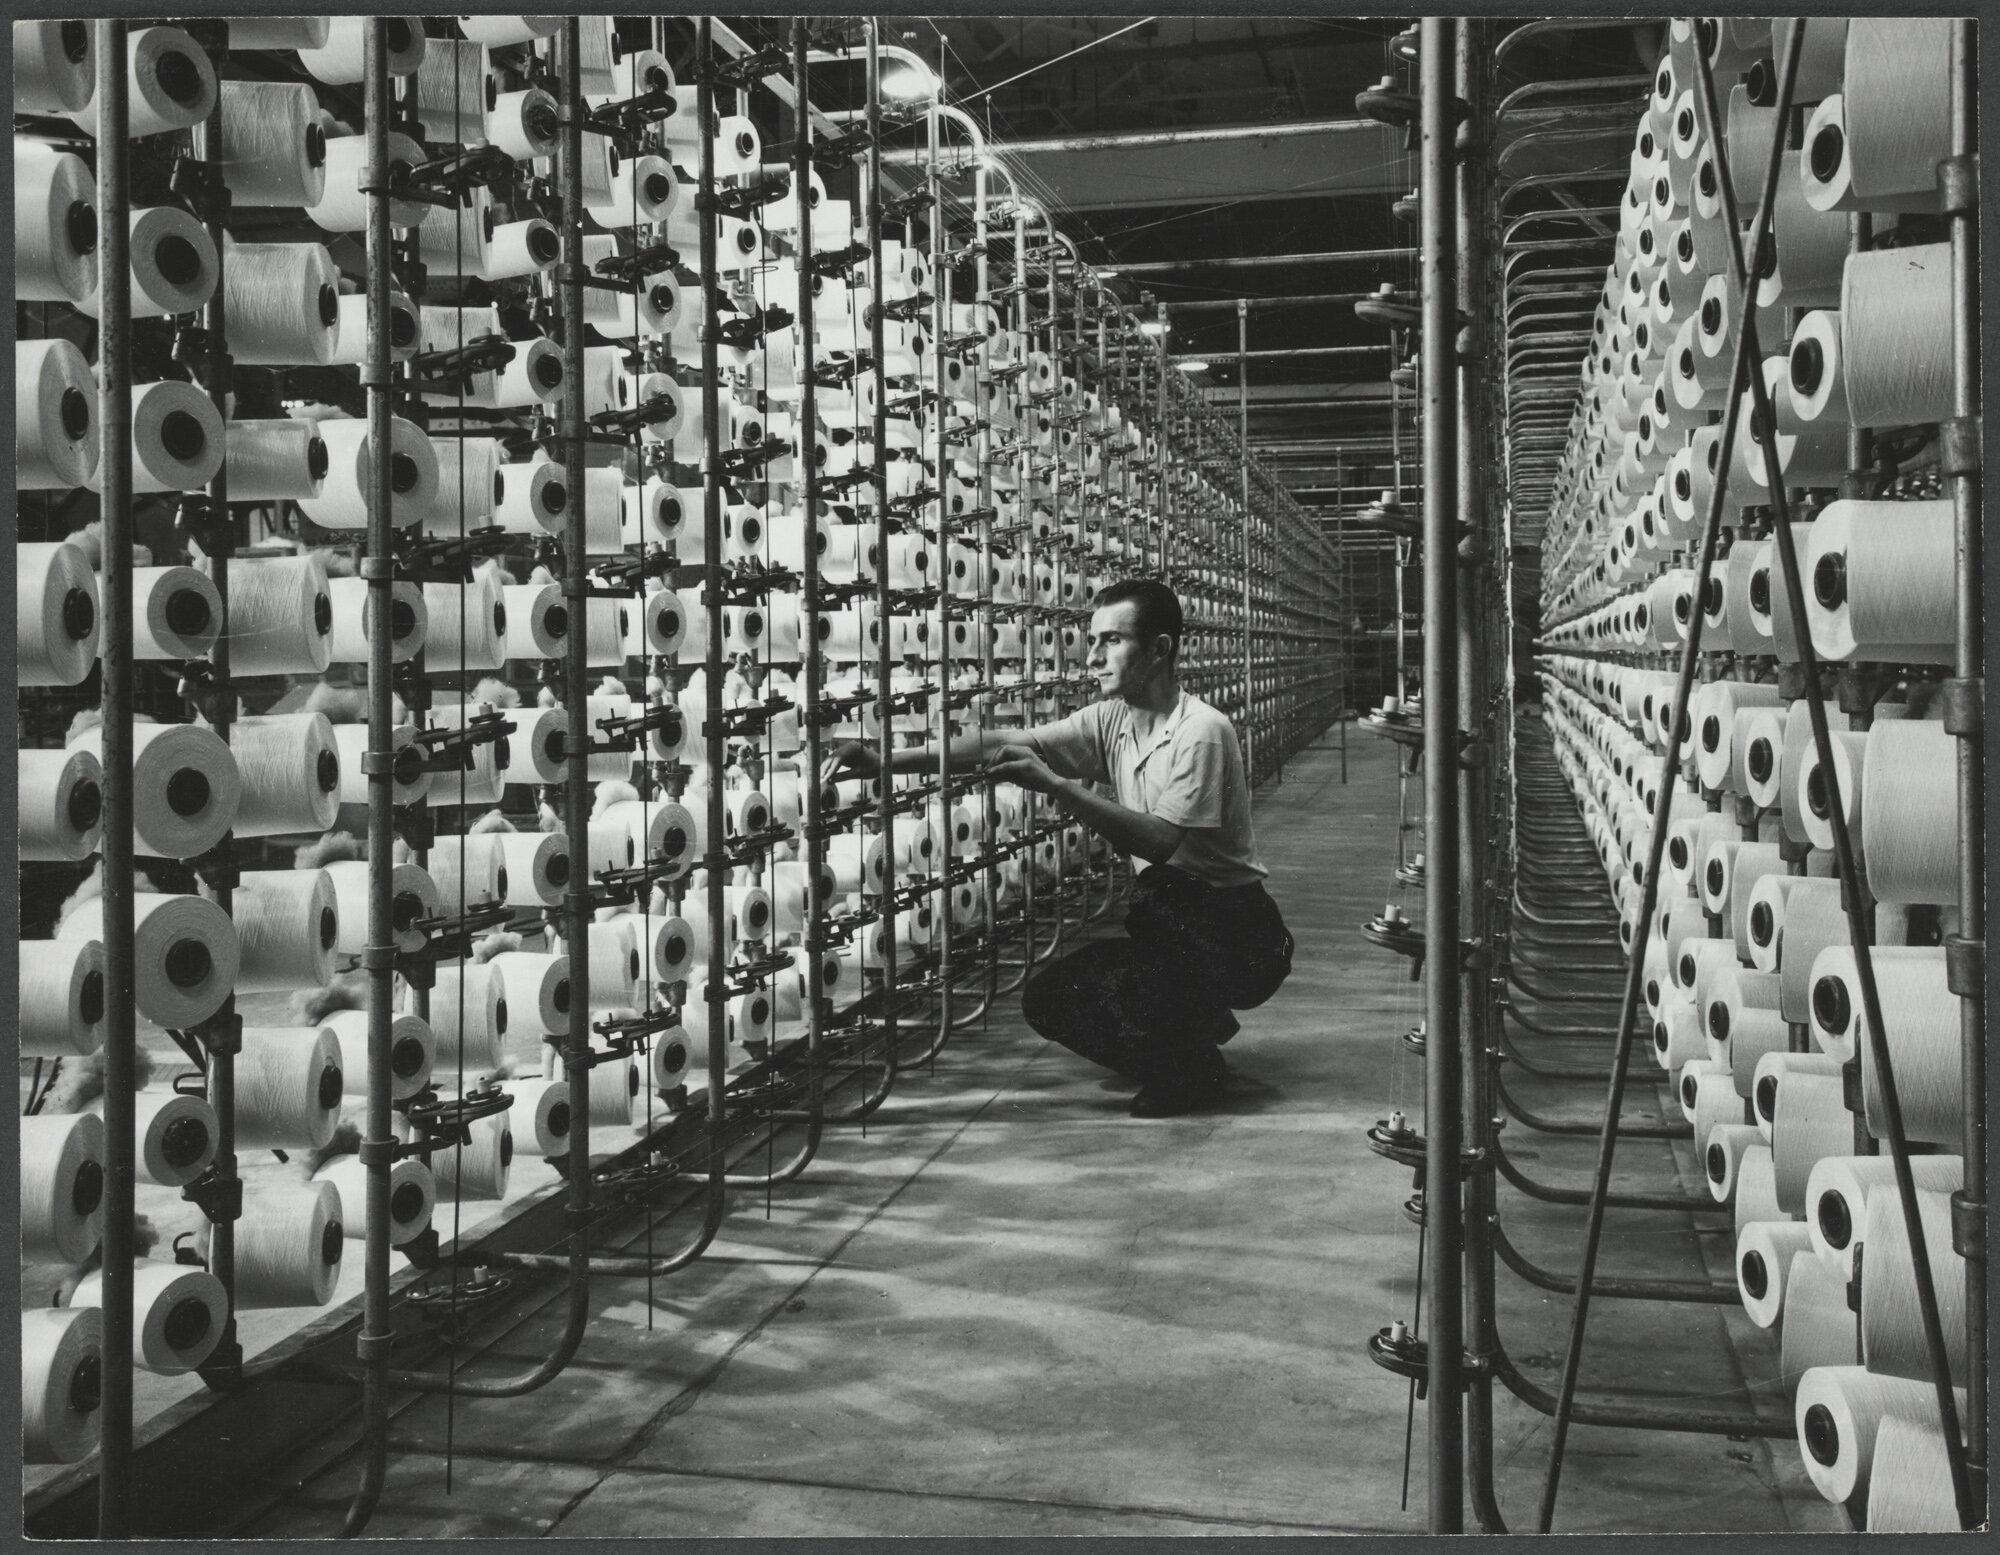 textile-factory-2.jpg